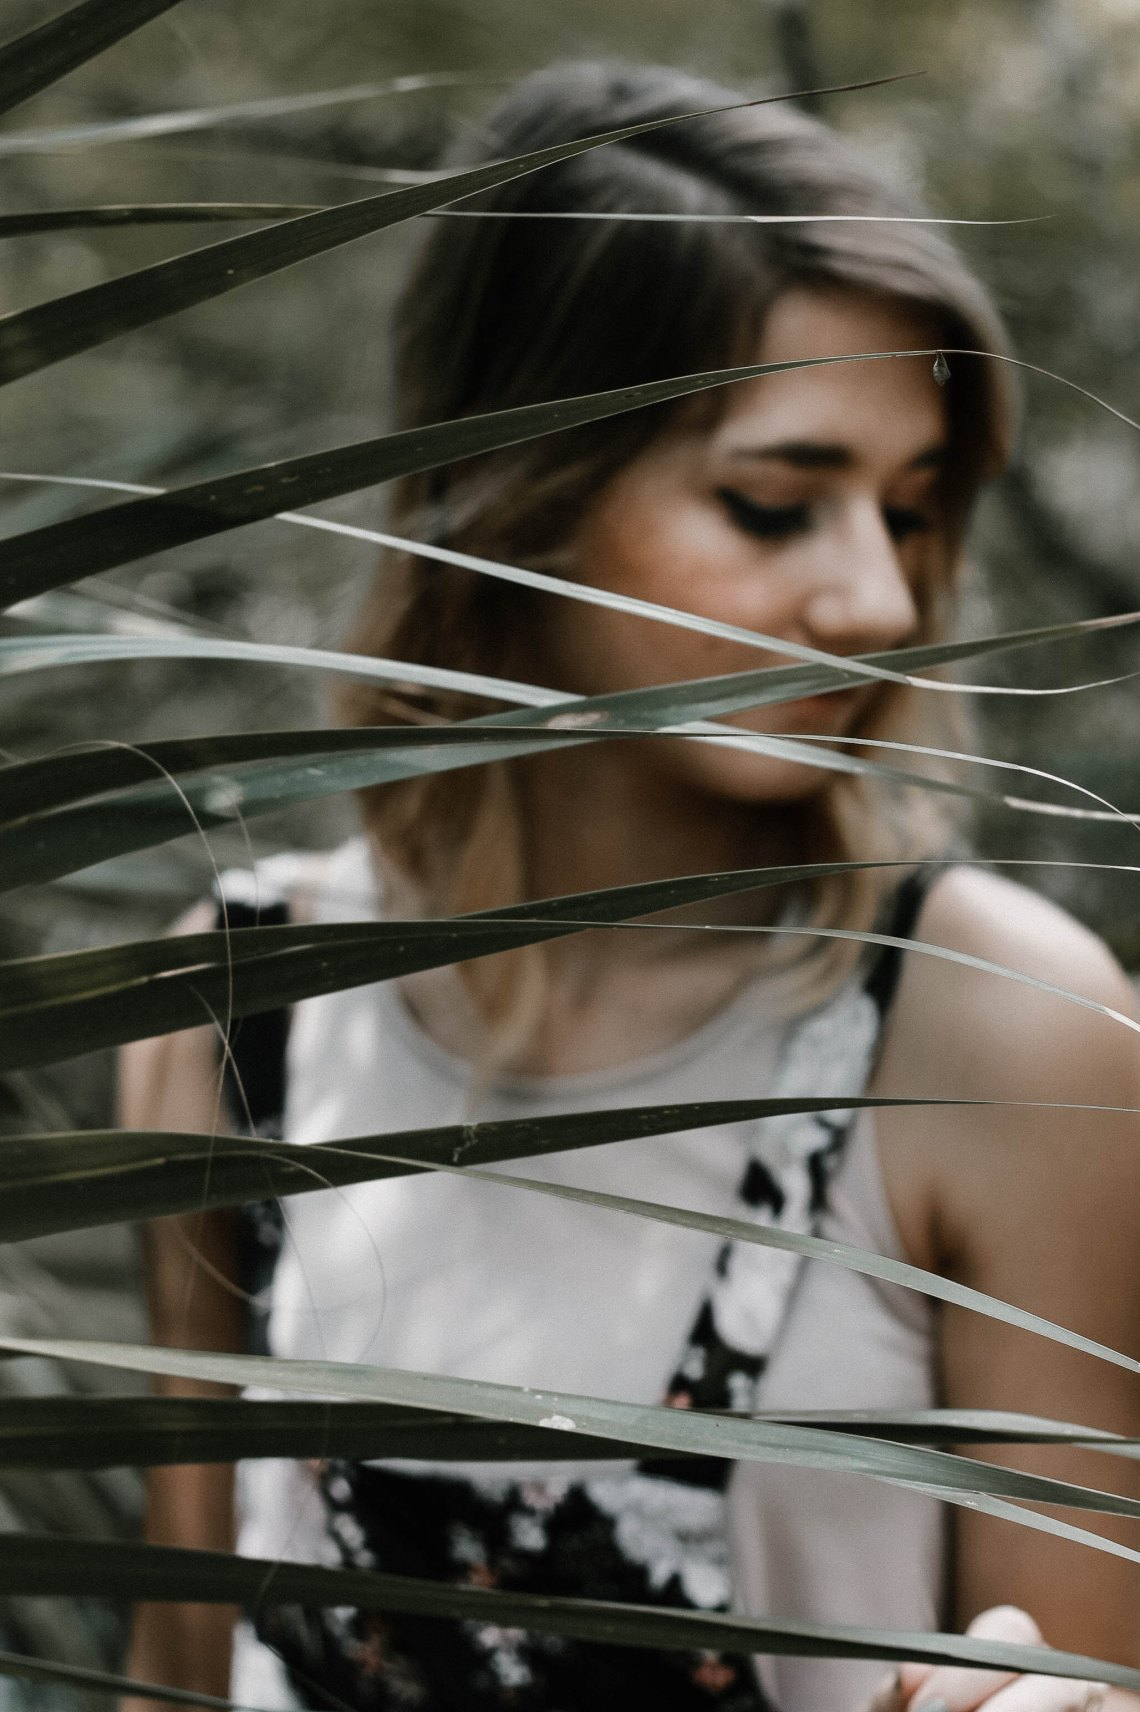 girl lost person